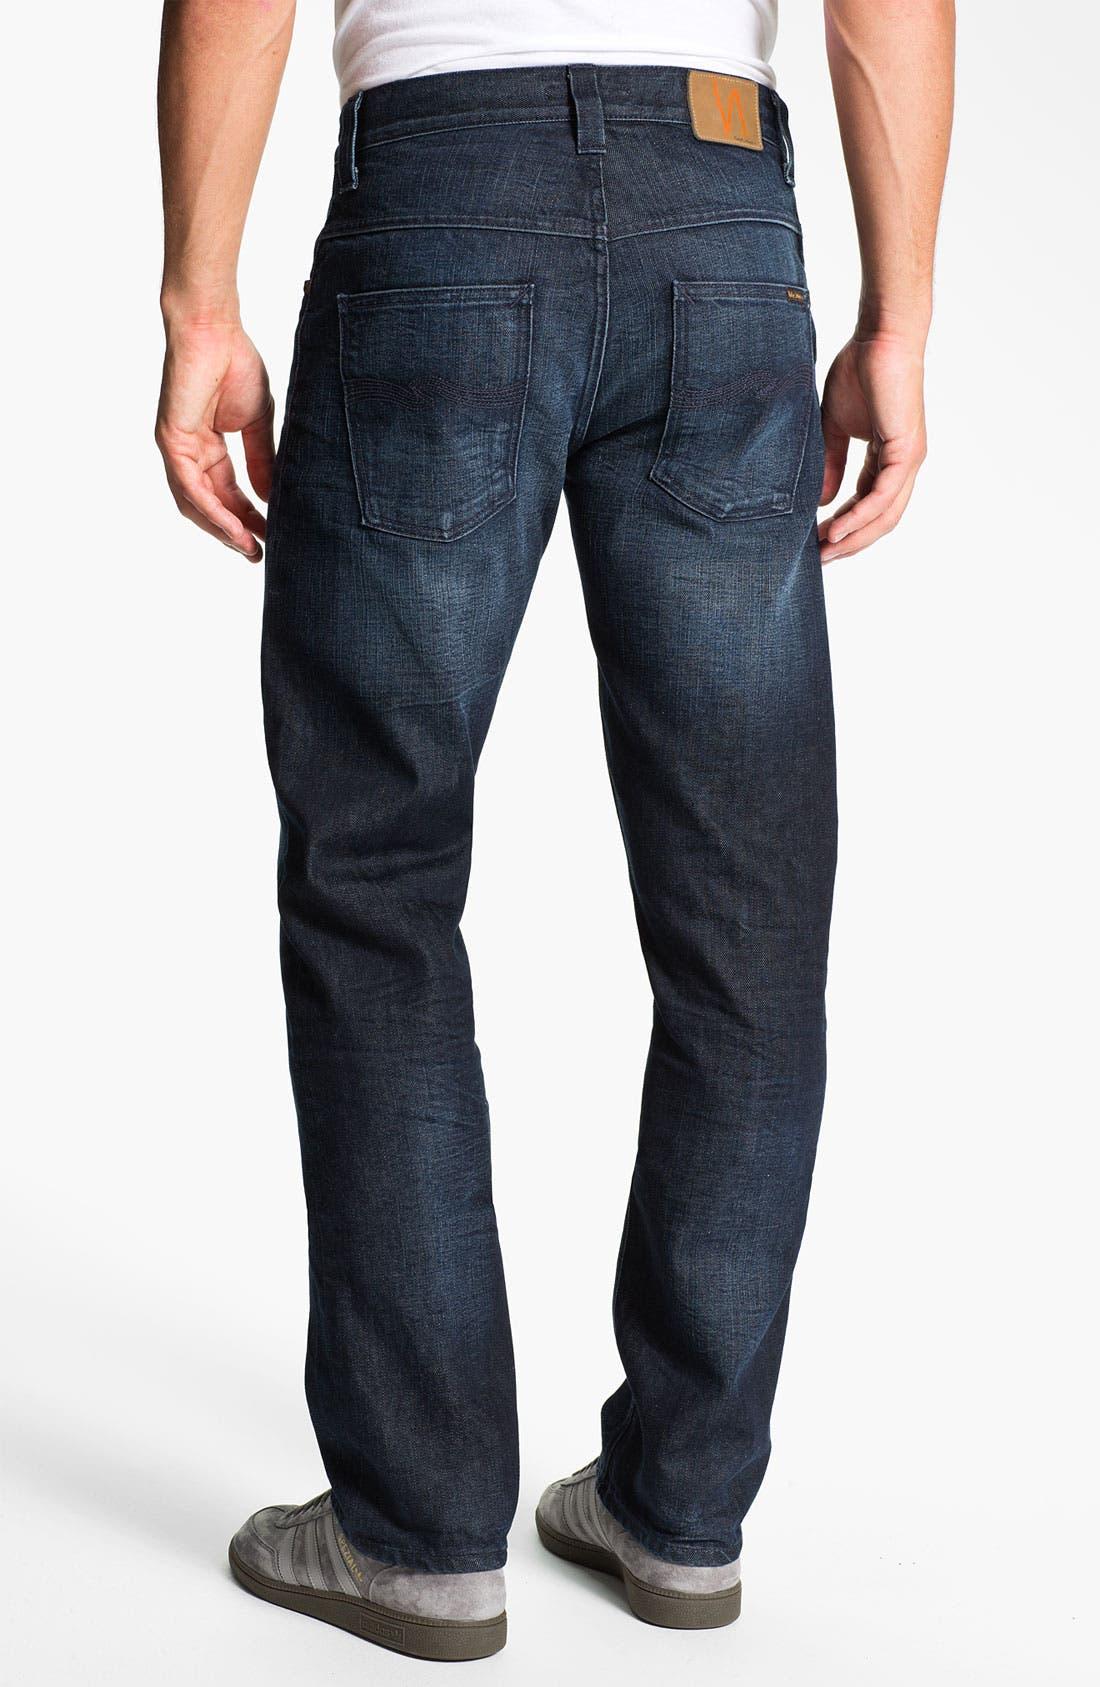 Alternate Image 1 Selected - Nudie 'Hank Rey' Straight Leg Jeans (Organic All Crinkled Up)